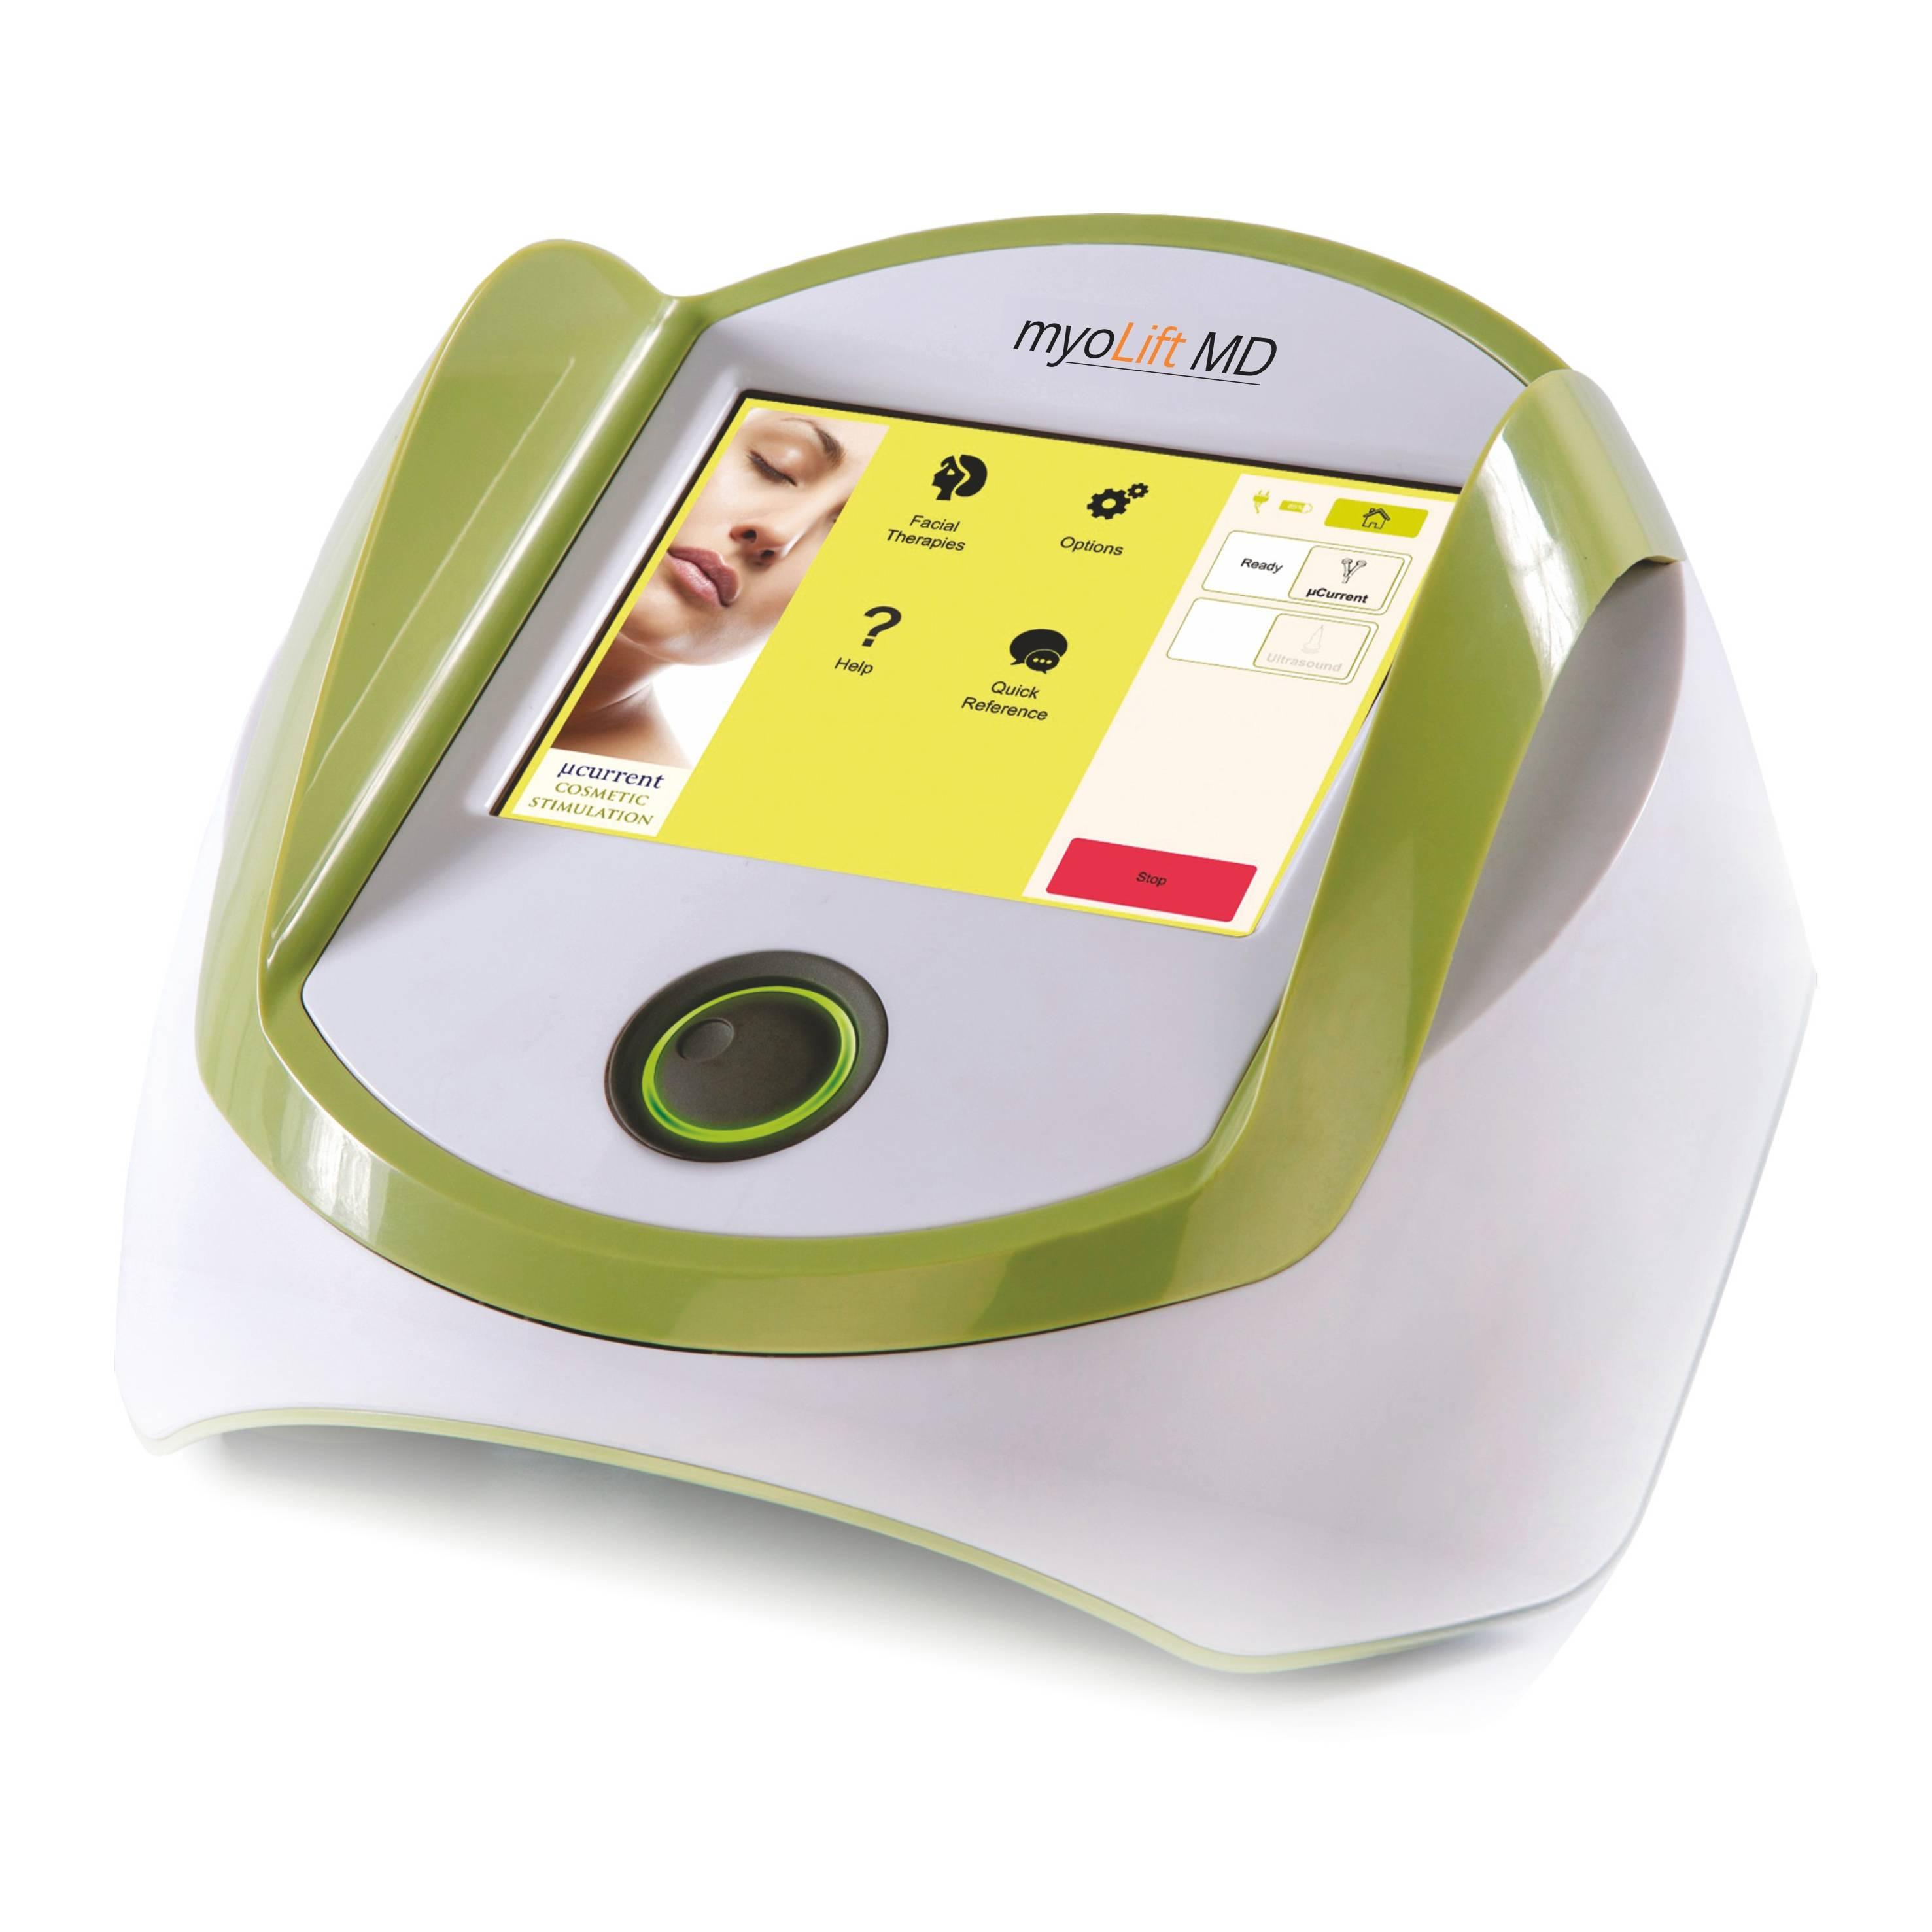 Myolift MD | Professional Microcurrent Machine | 7E Wellness